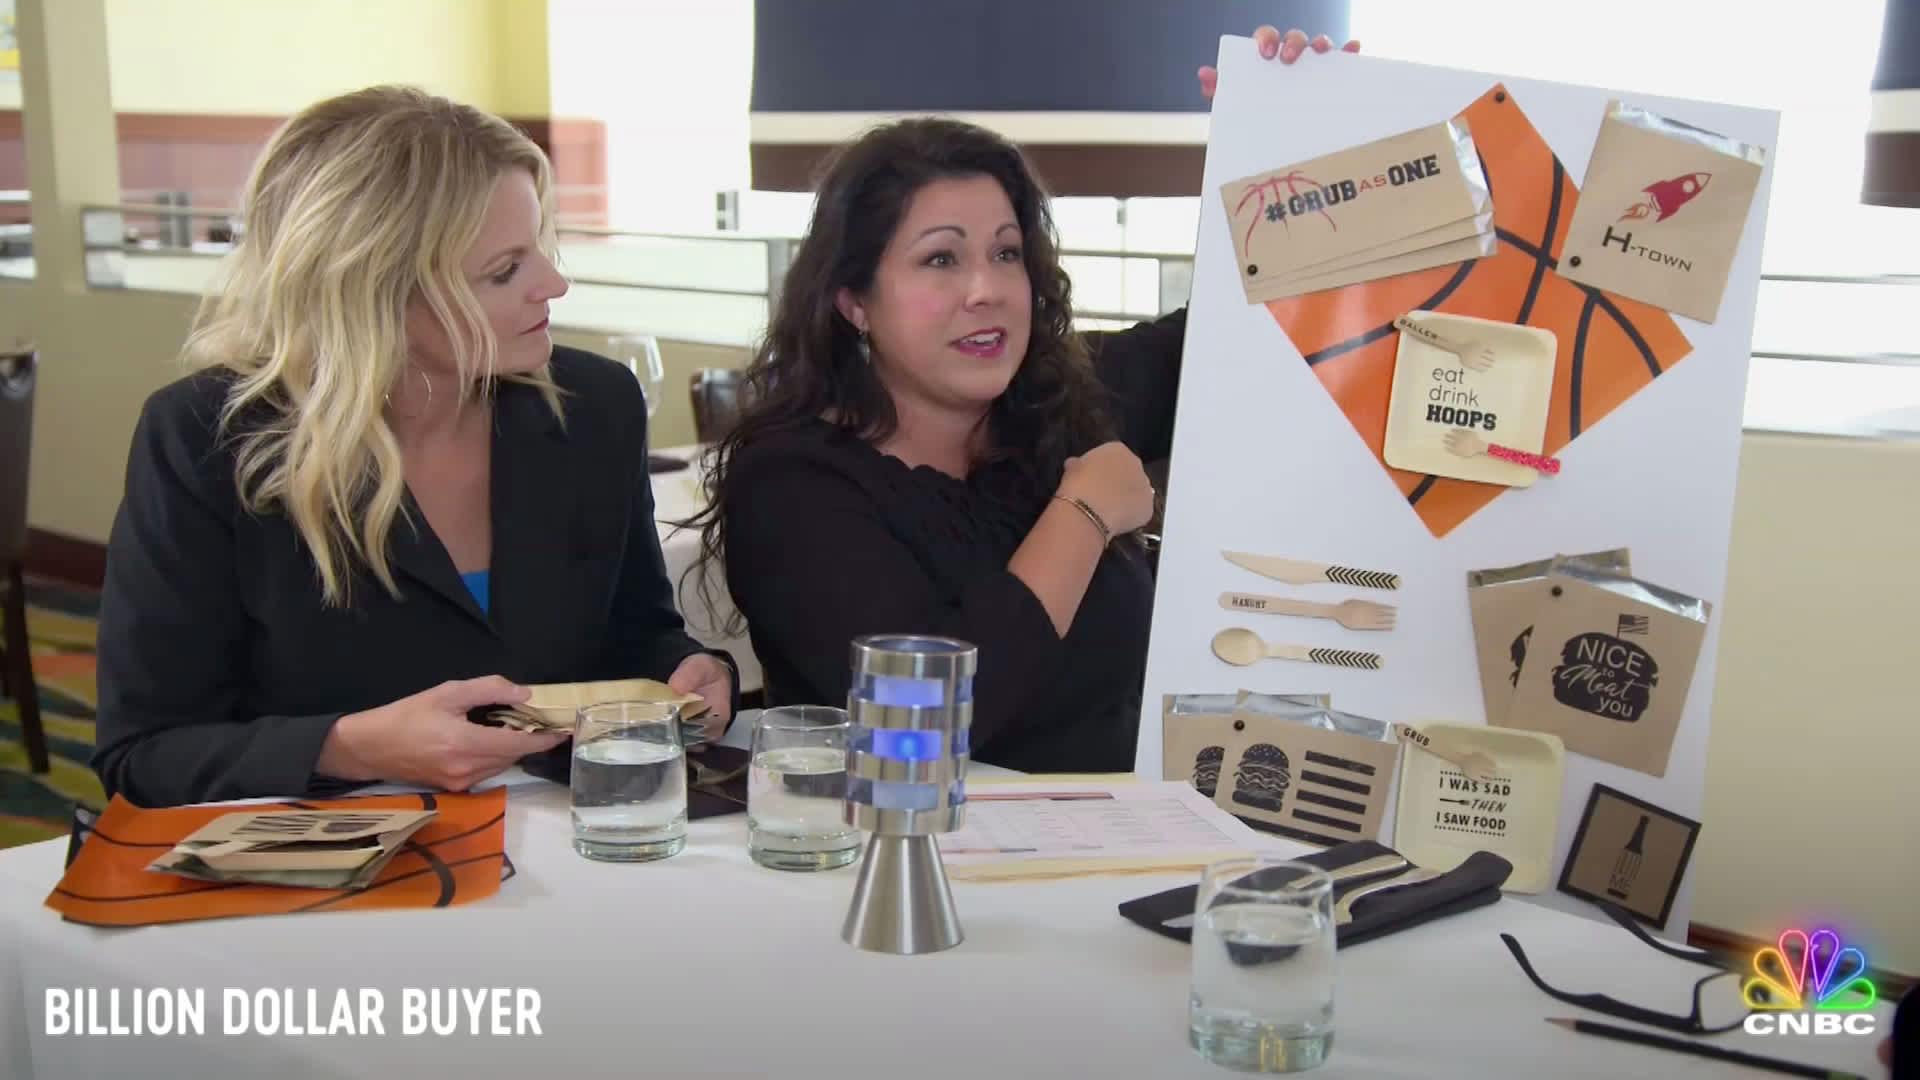 Billion Dollar Buyer – Home | CNBC Prime